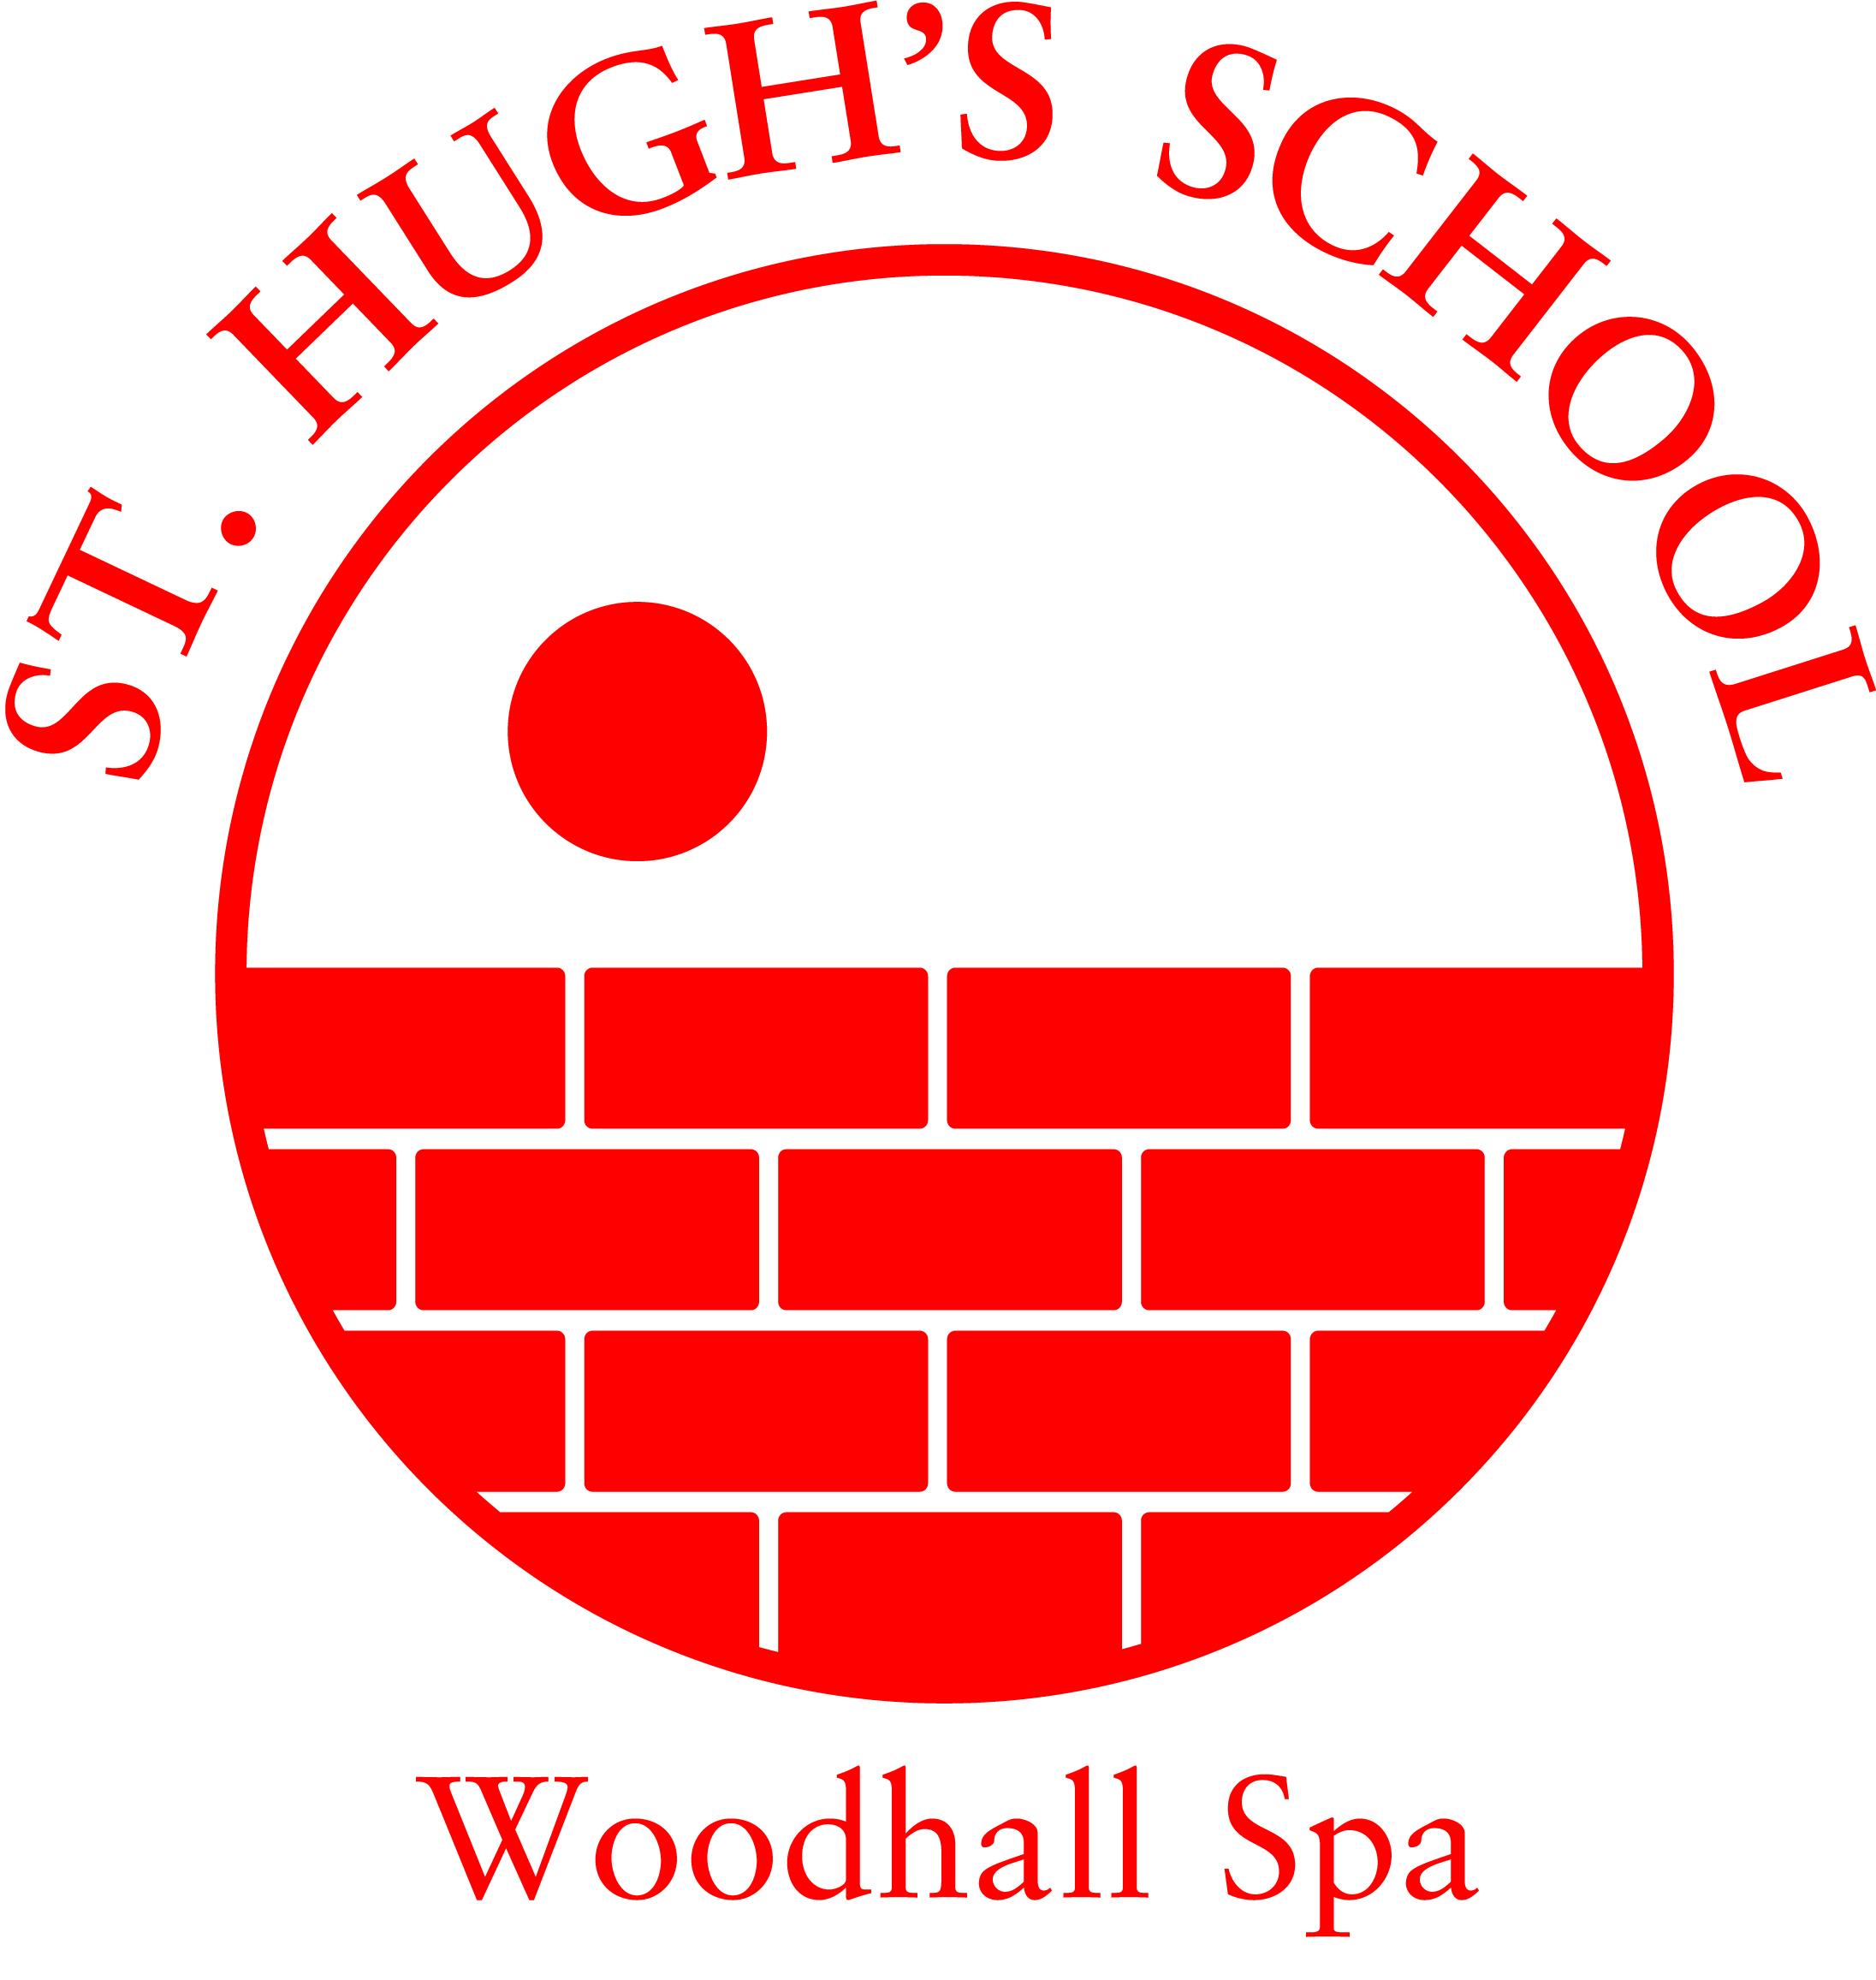 St Hugh's School